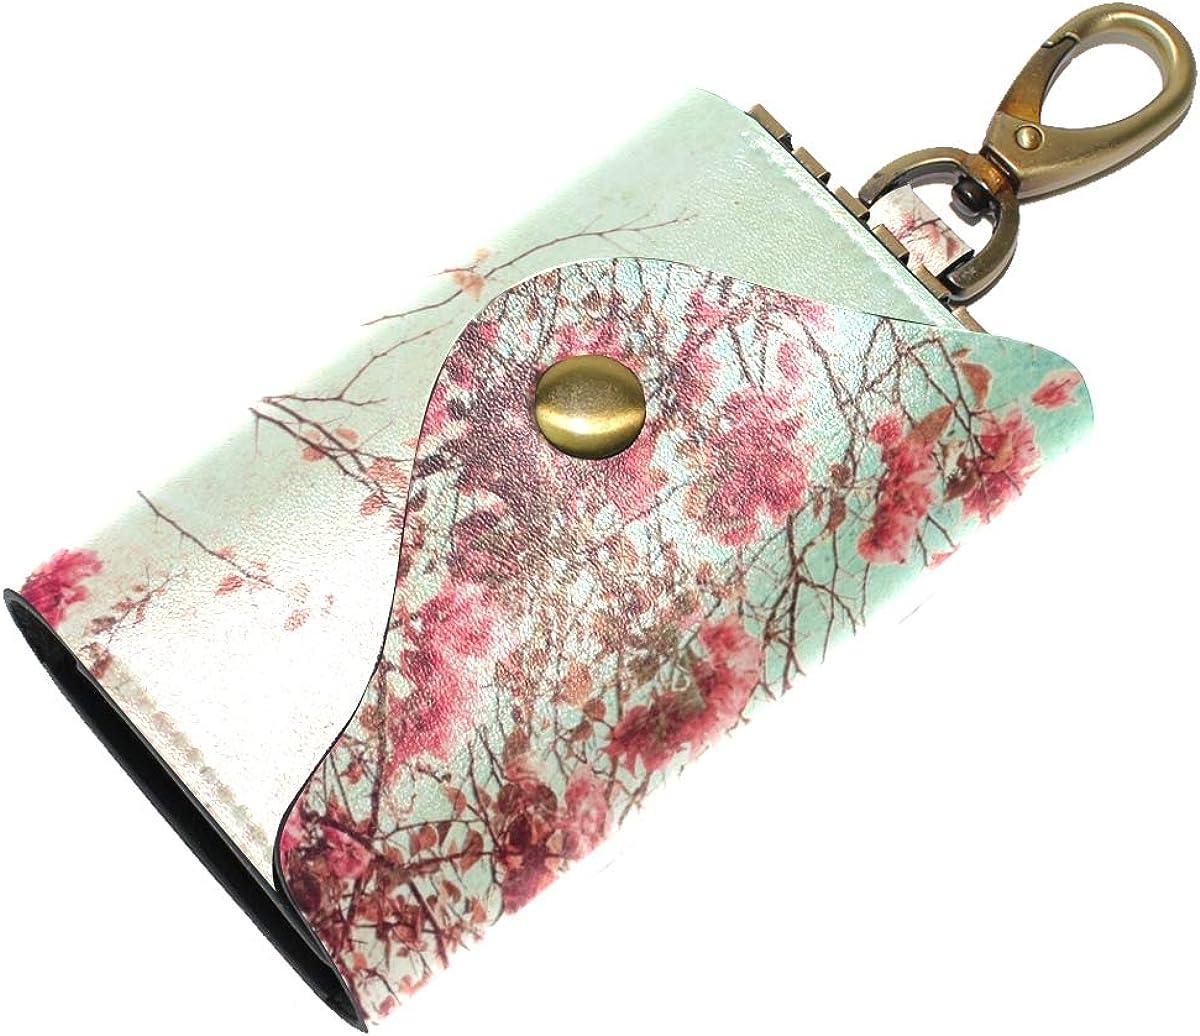 KEAKIA Flowers Leather Key Case Wallets Tri-fold Key Holder Keychains with 6 Hooks 2 Slot Snap Closure for Men Women